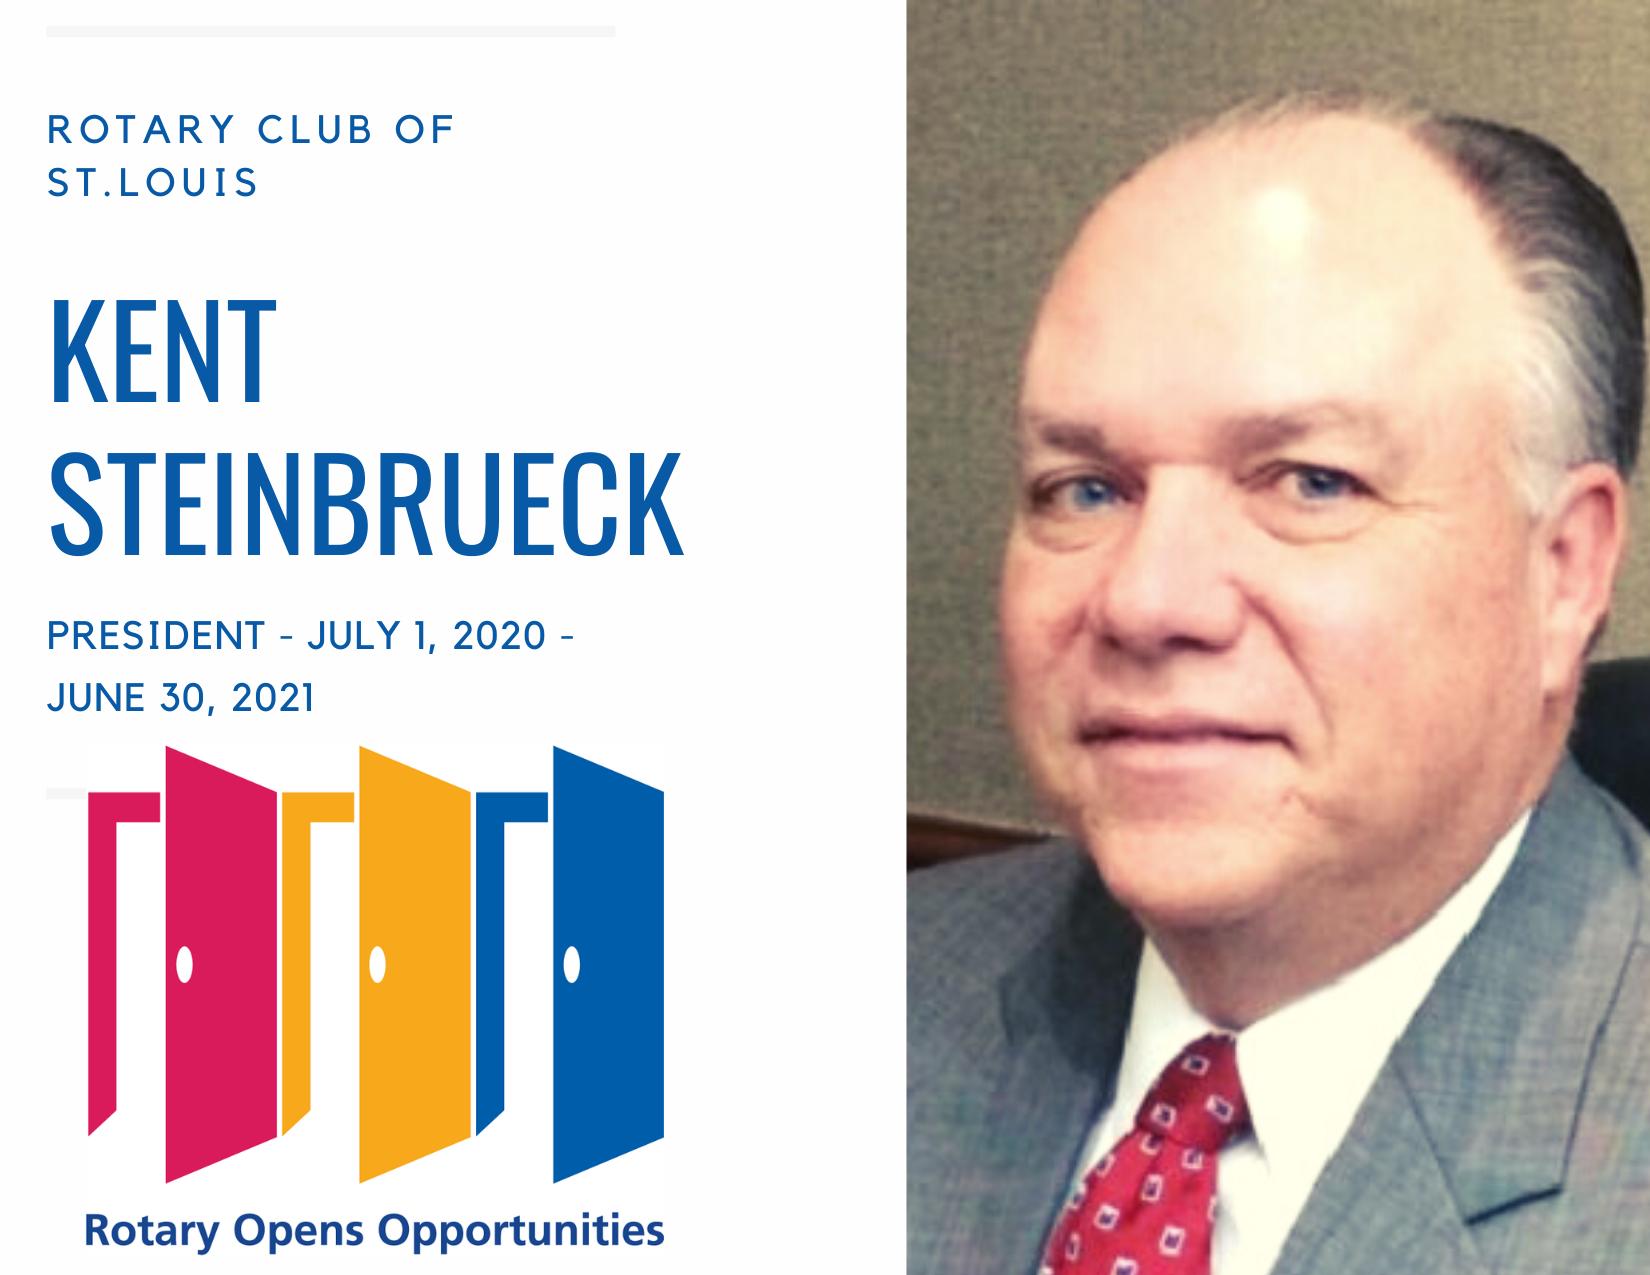 President Kent Steinbrueck - Rotary Club of St. Louis, July 1, 2020 - June 30, 2021